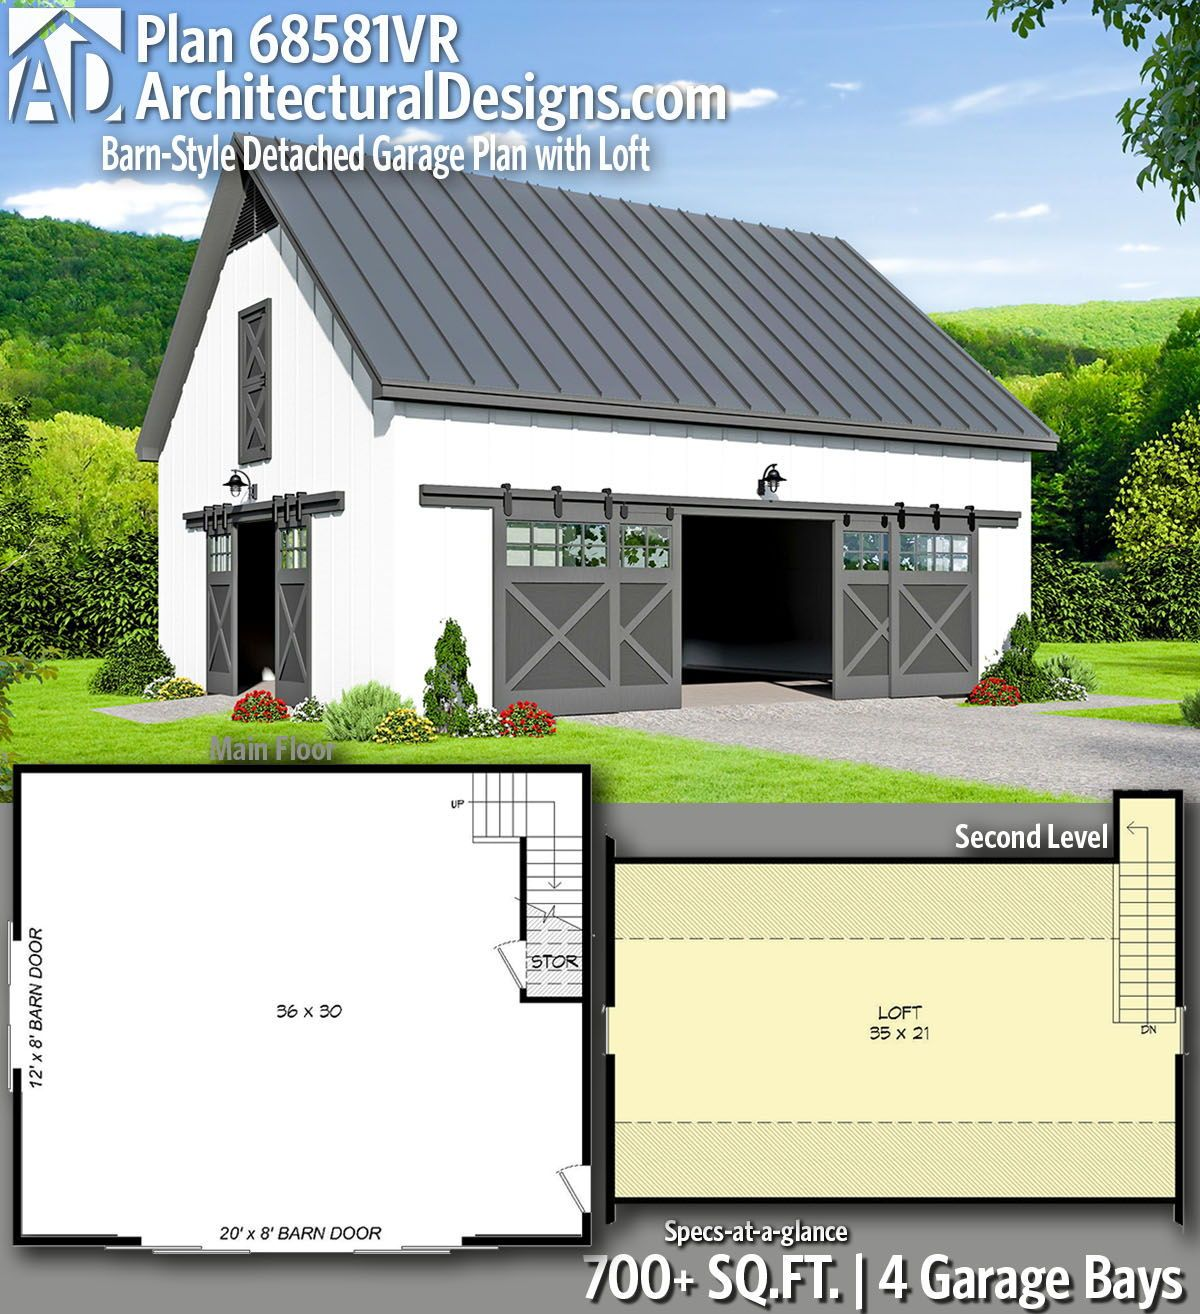 Plan 68571vr Modern Duplex House Plan With An Rv Garage Garage Plans With Loft Carriage House Plans Duplex House Plans